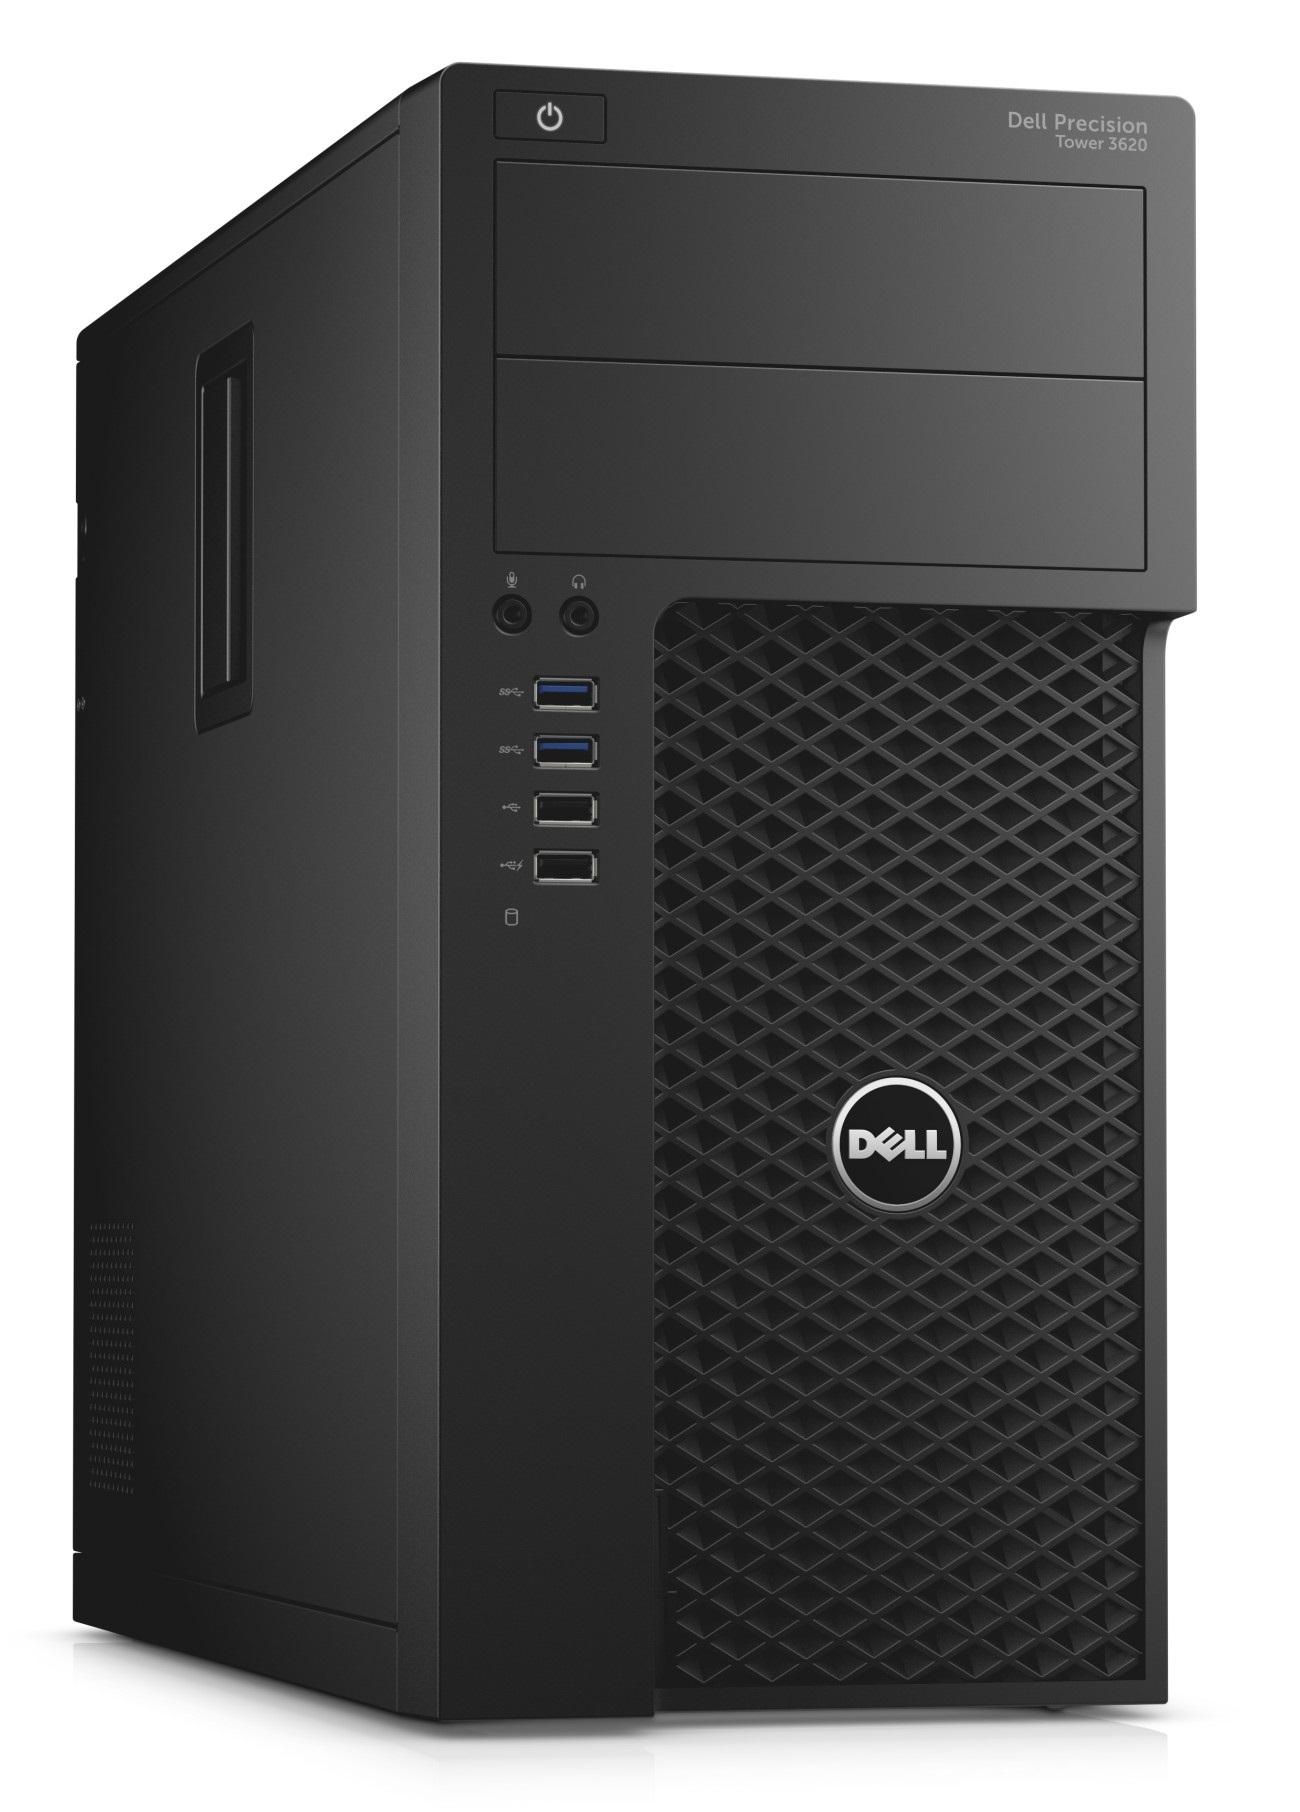 Dell Precision T3620 MT i7-6700/8G/1TB/P400-2G/DP/MCR/W7Pro+W10P/3R NBD